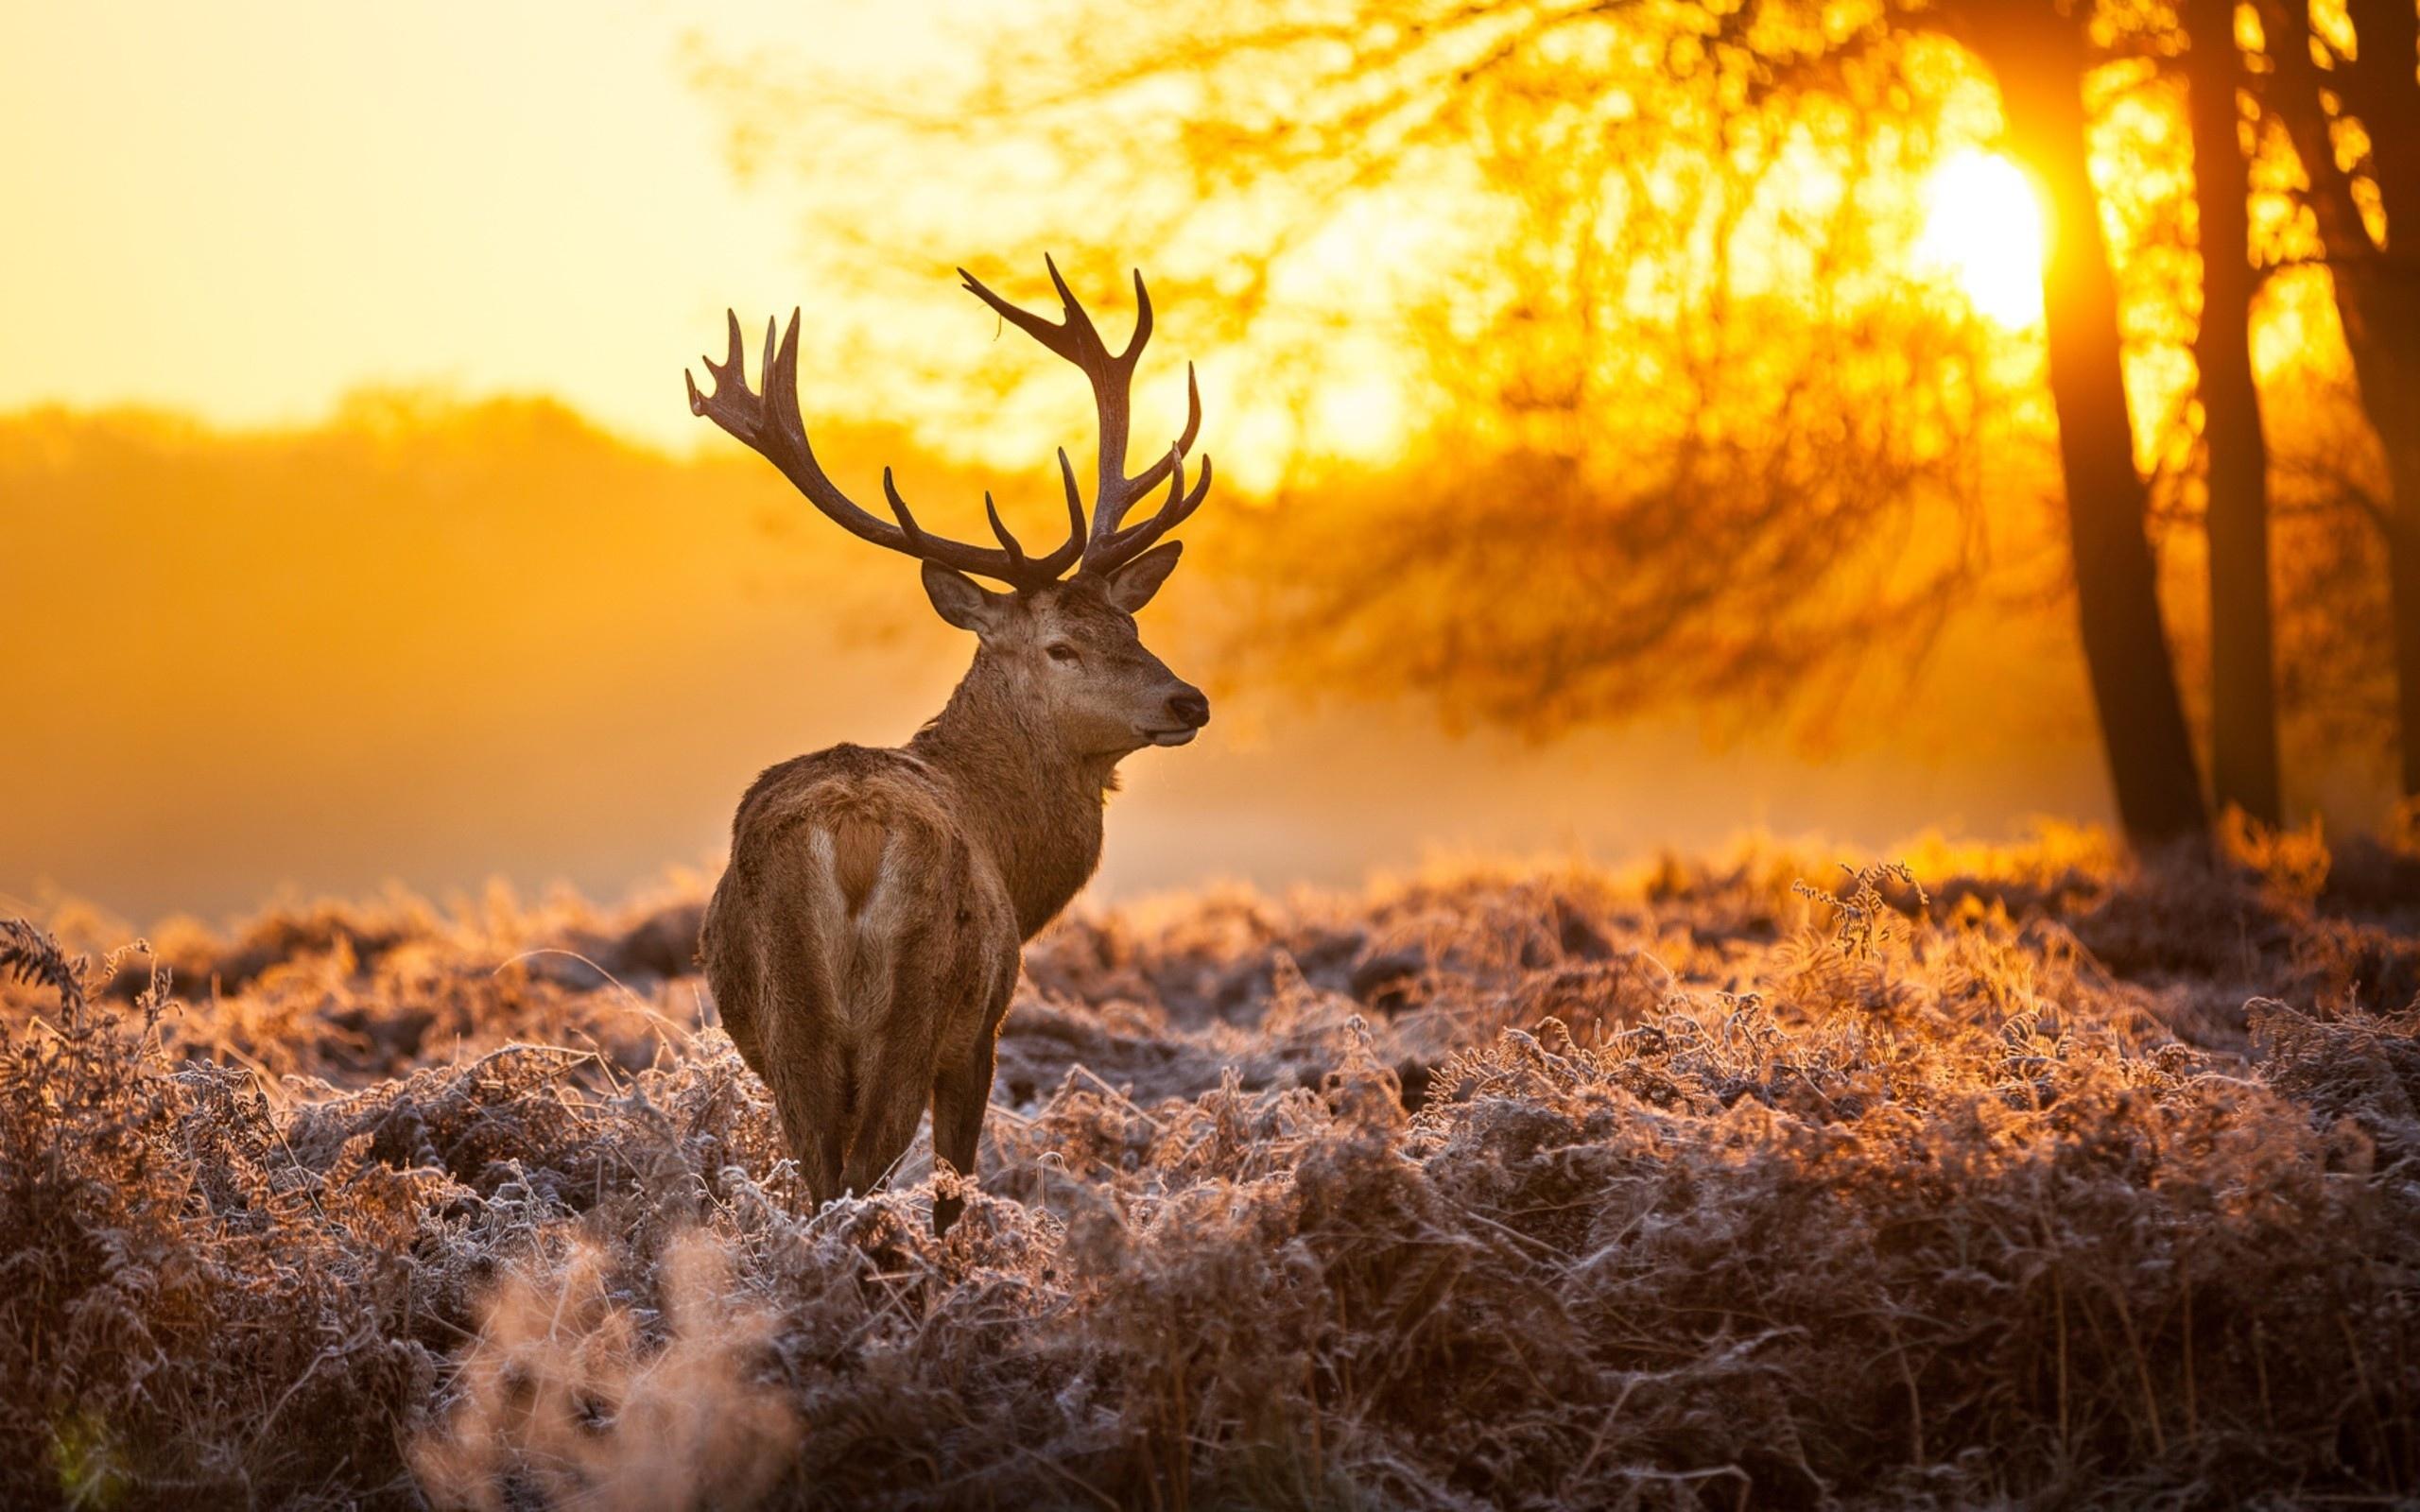 Deer Wallpaper; Deer Wallpaper; Deer Wallpaper ...